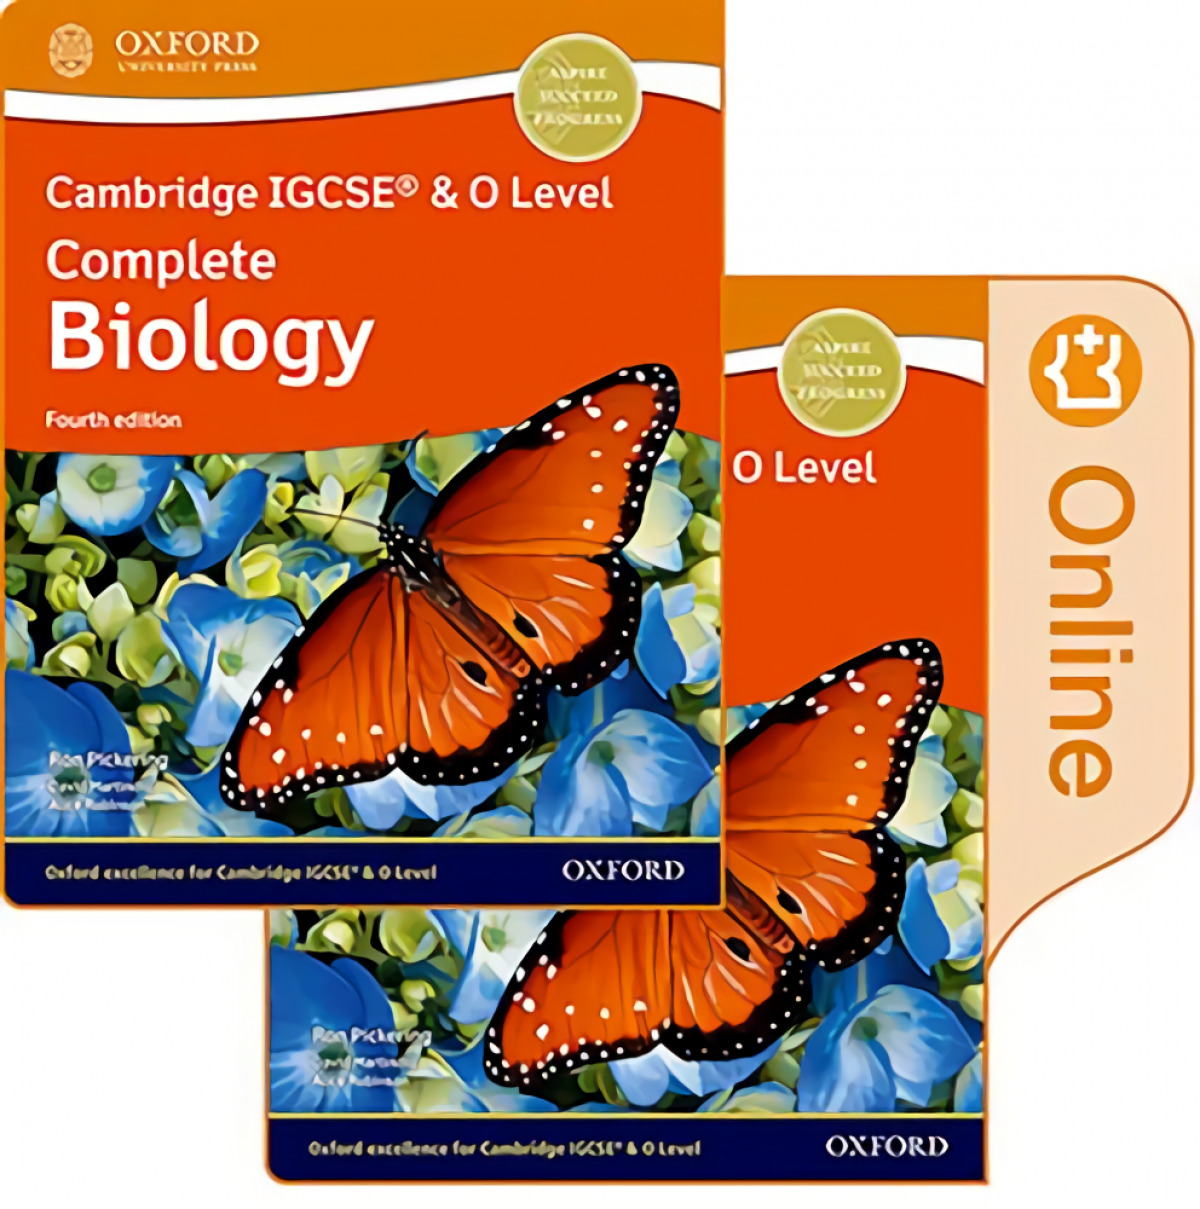 CAMBRIDGE IGCSE (R) LEVEL COMPLETE BIOLOGY PRINT+O